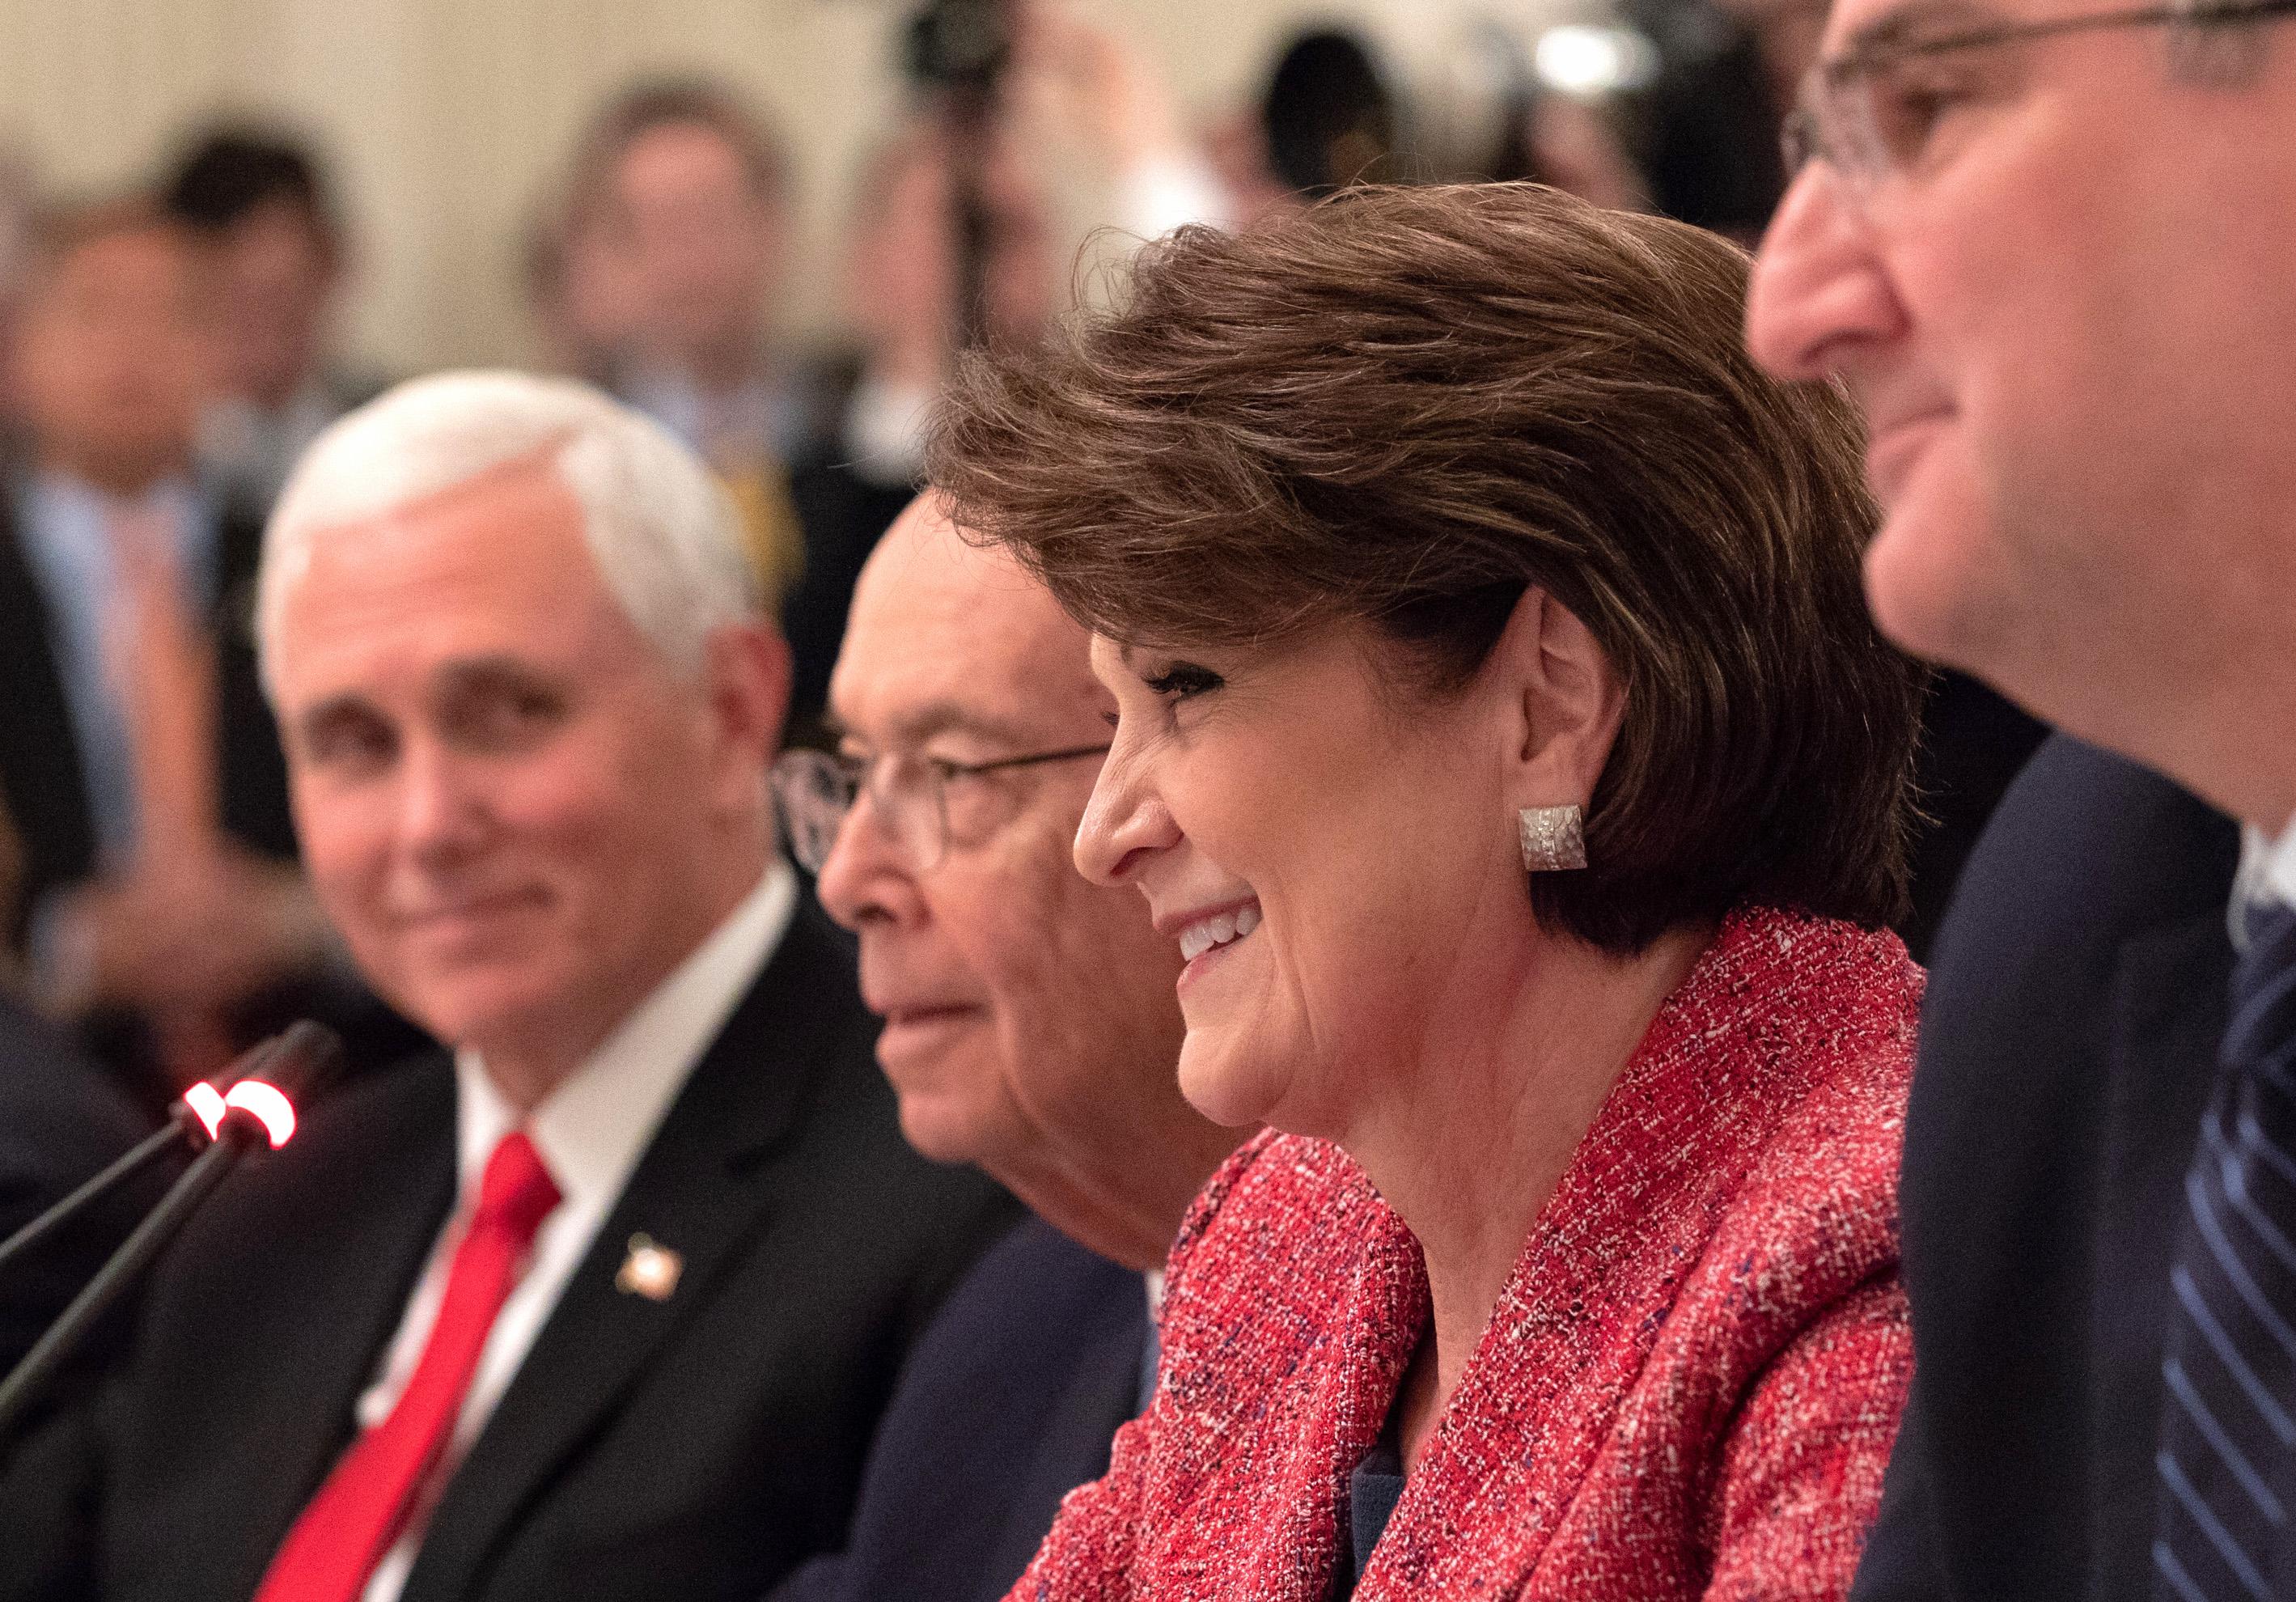 Marillyn Hewson Stepping Down as Lockheed Martin CEO - USNI News